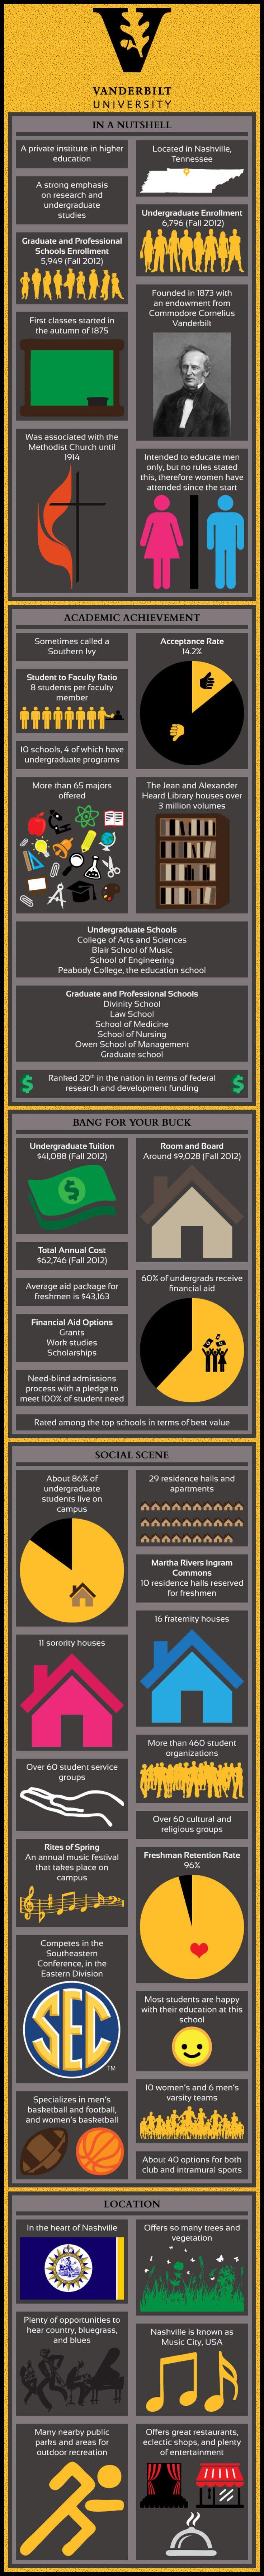 Vanderbilt University Infographic